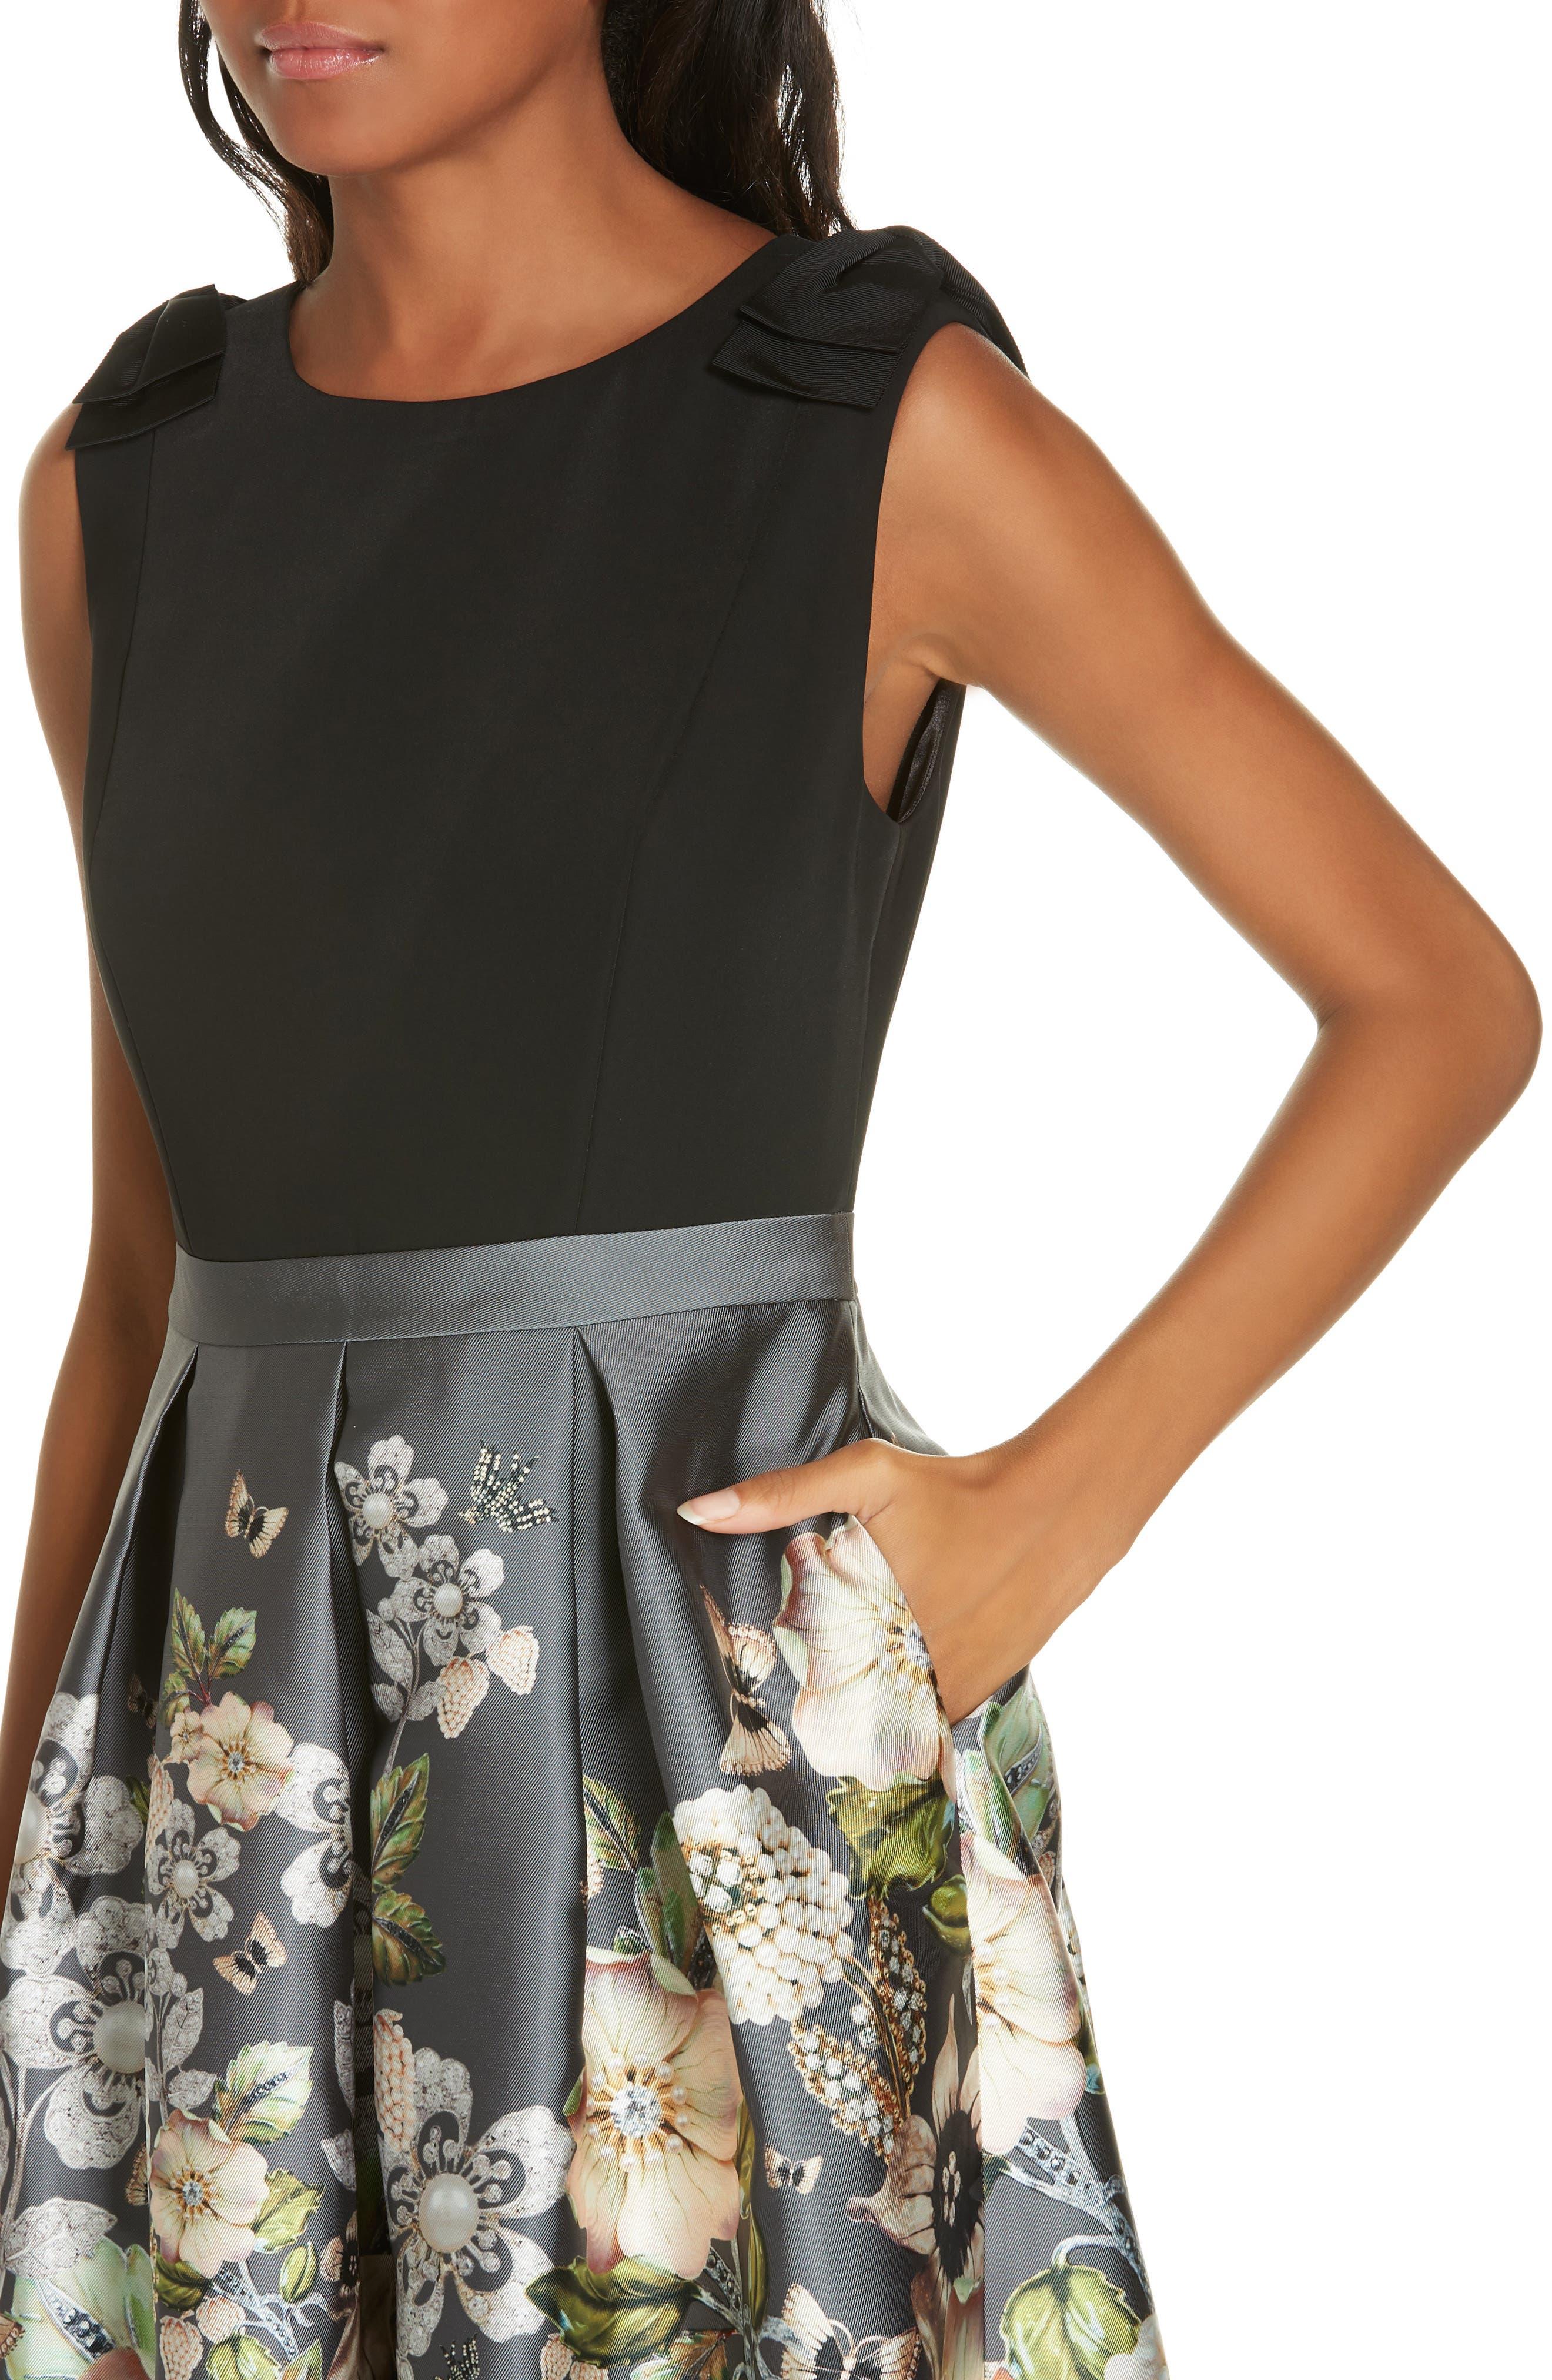 Molyka Gem Gardens Bow Dress,                             Alternate thumbnail 4, color,                             CHARCOAL